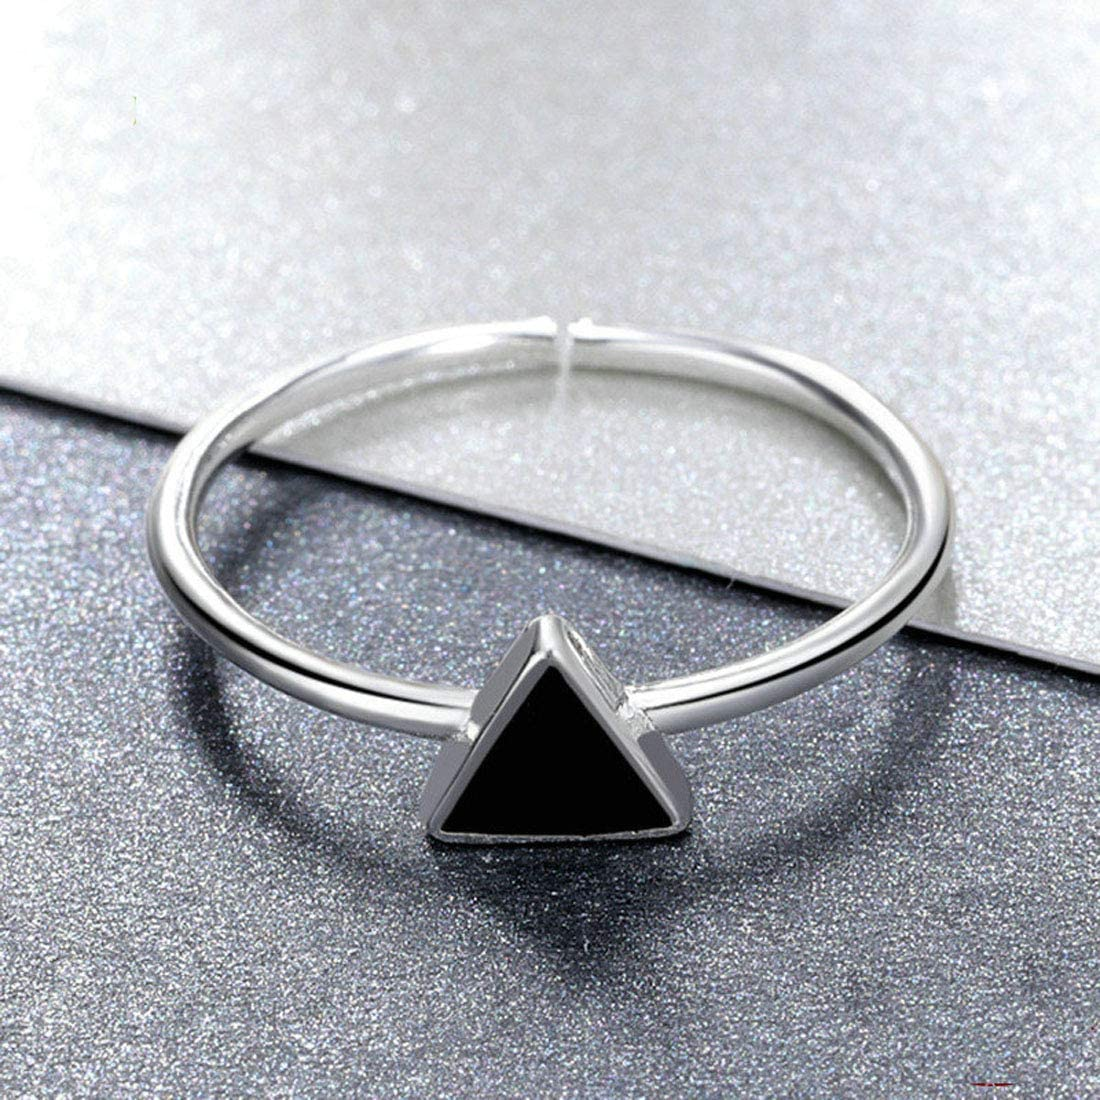 Amaer 925 Sterling Silver Geometry Open Ring for Women Teen Girl Simple Ring